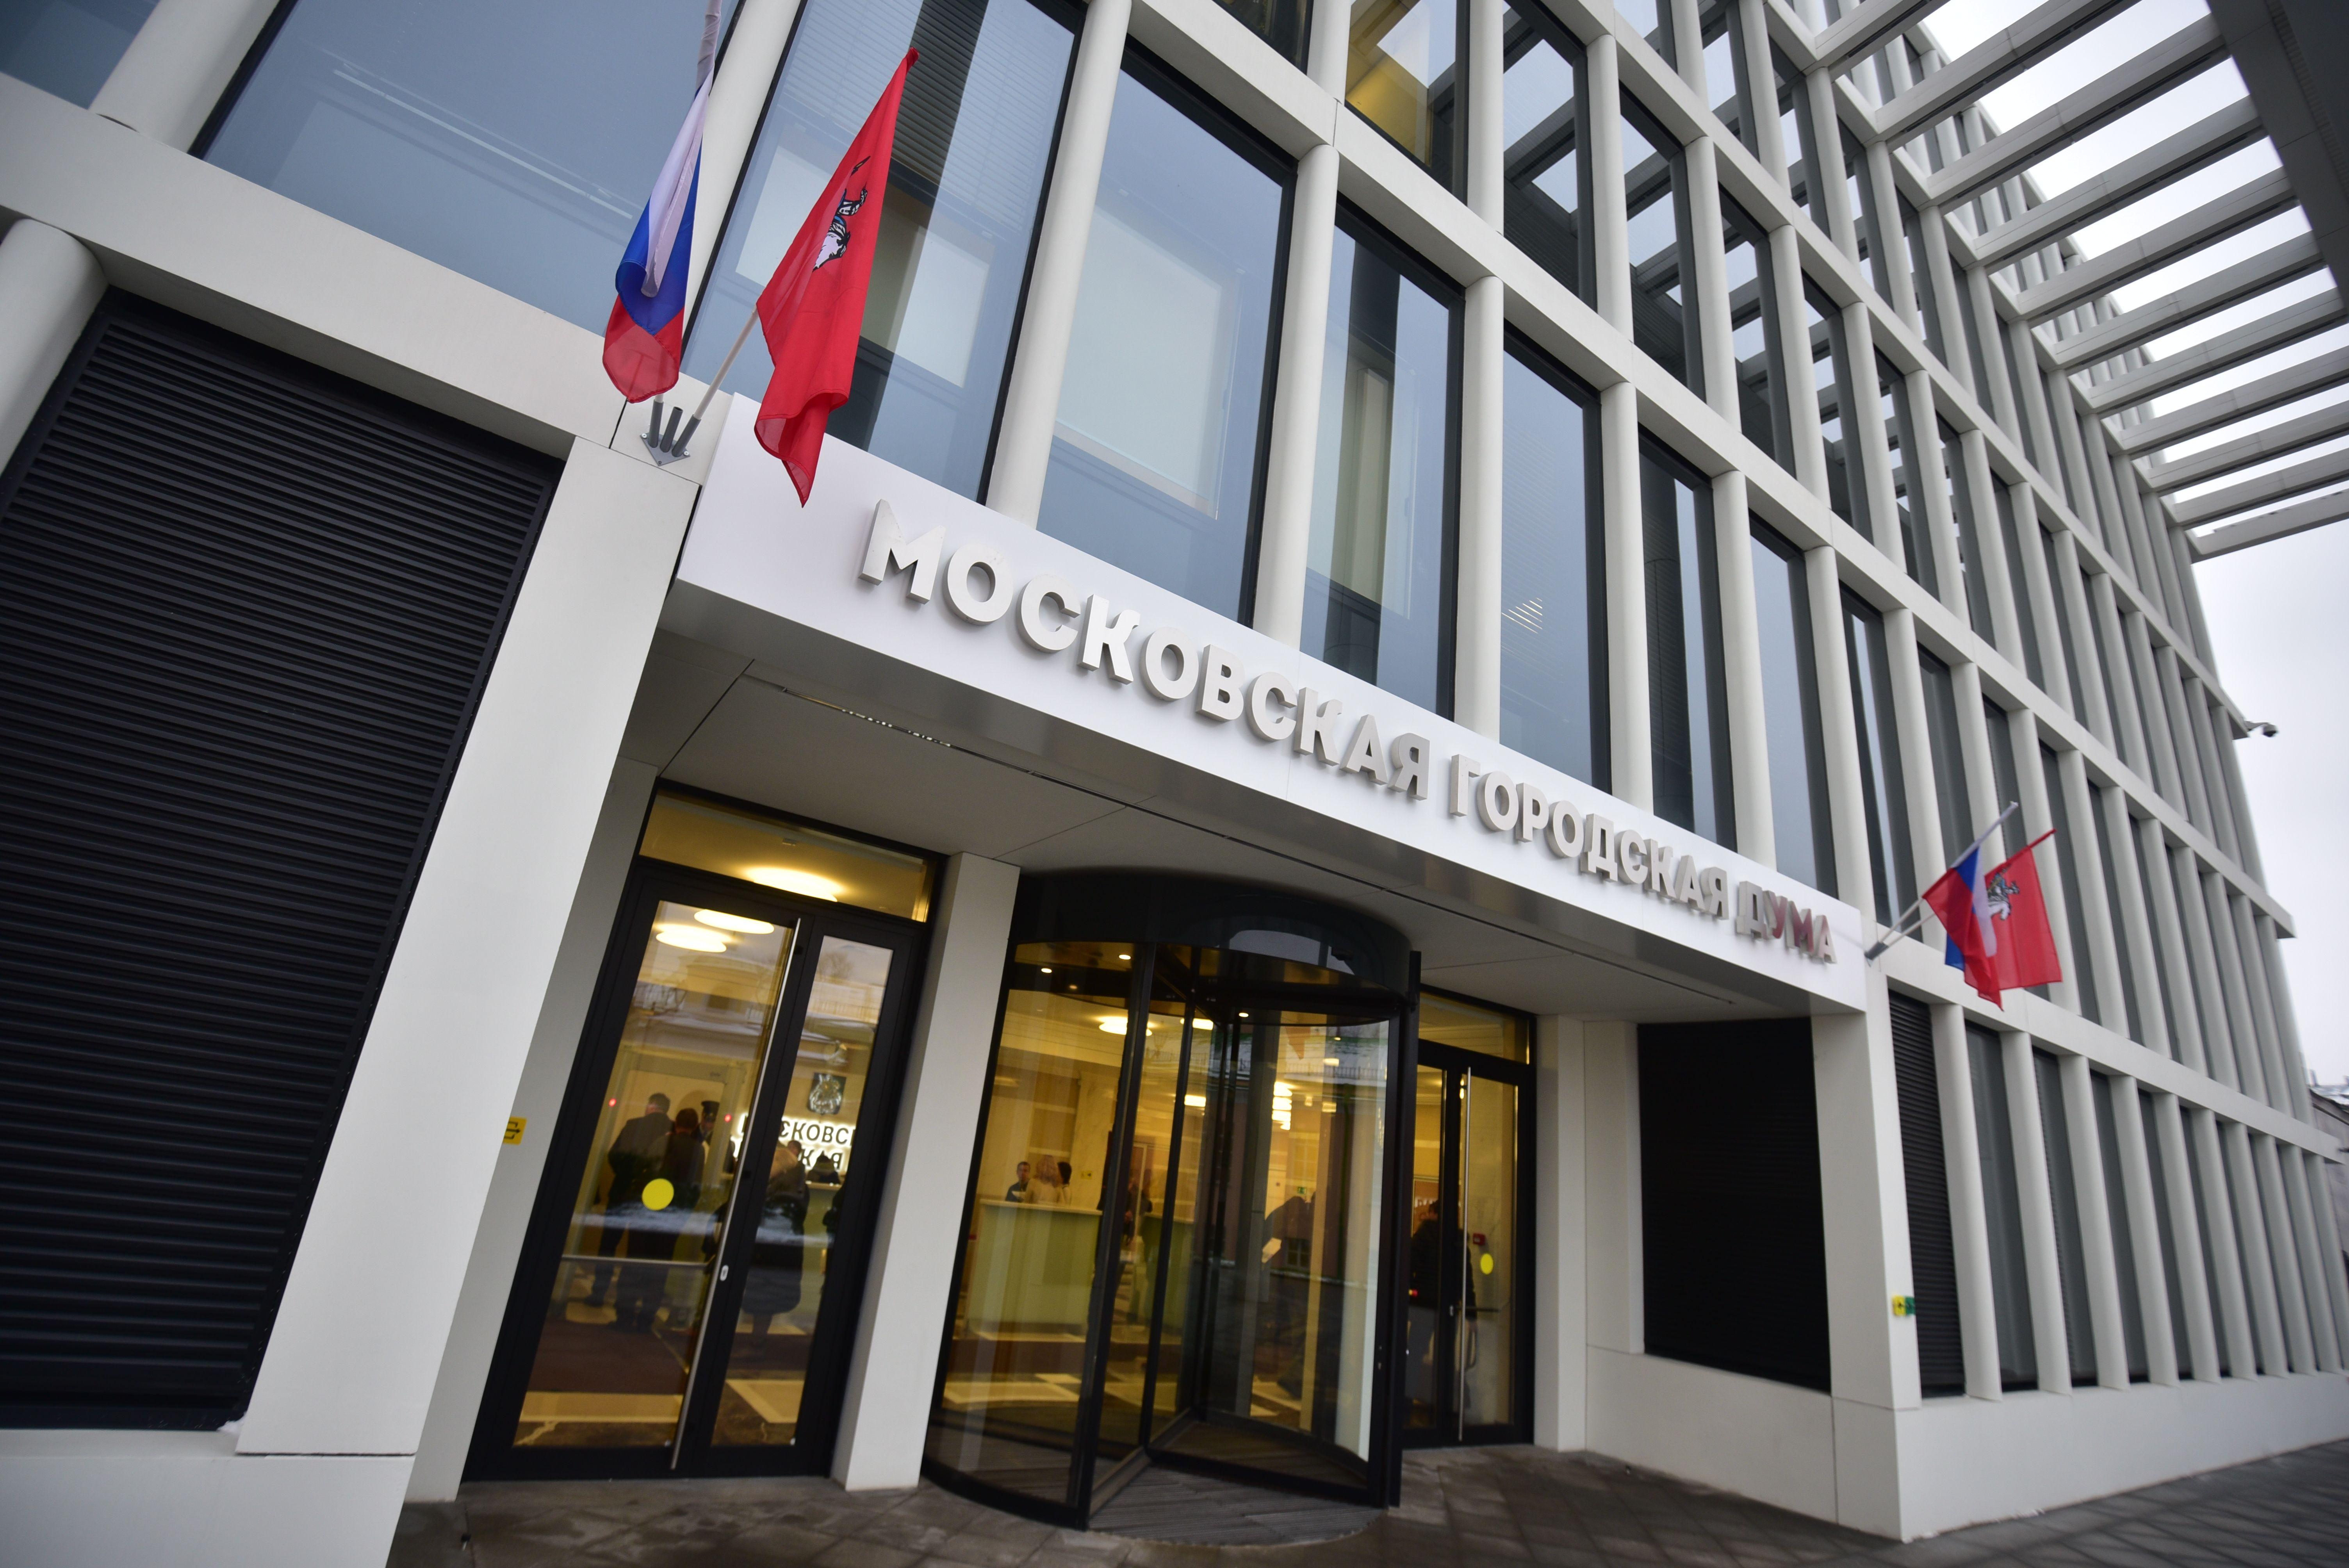 Депутат Николаева: Москва предоставит инвесторам 150 площадок в промзонах